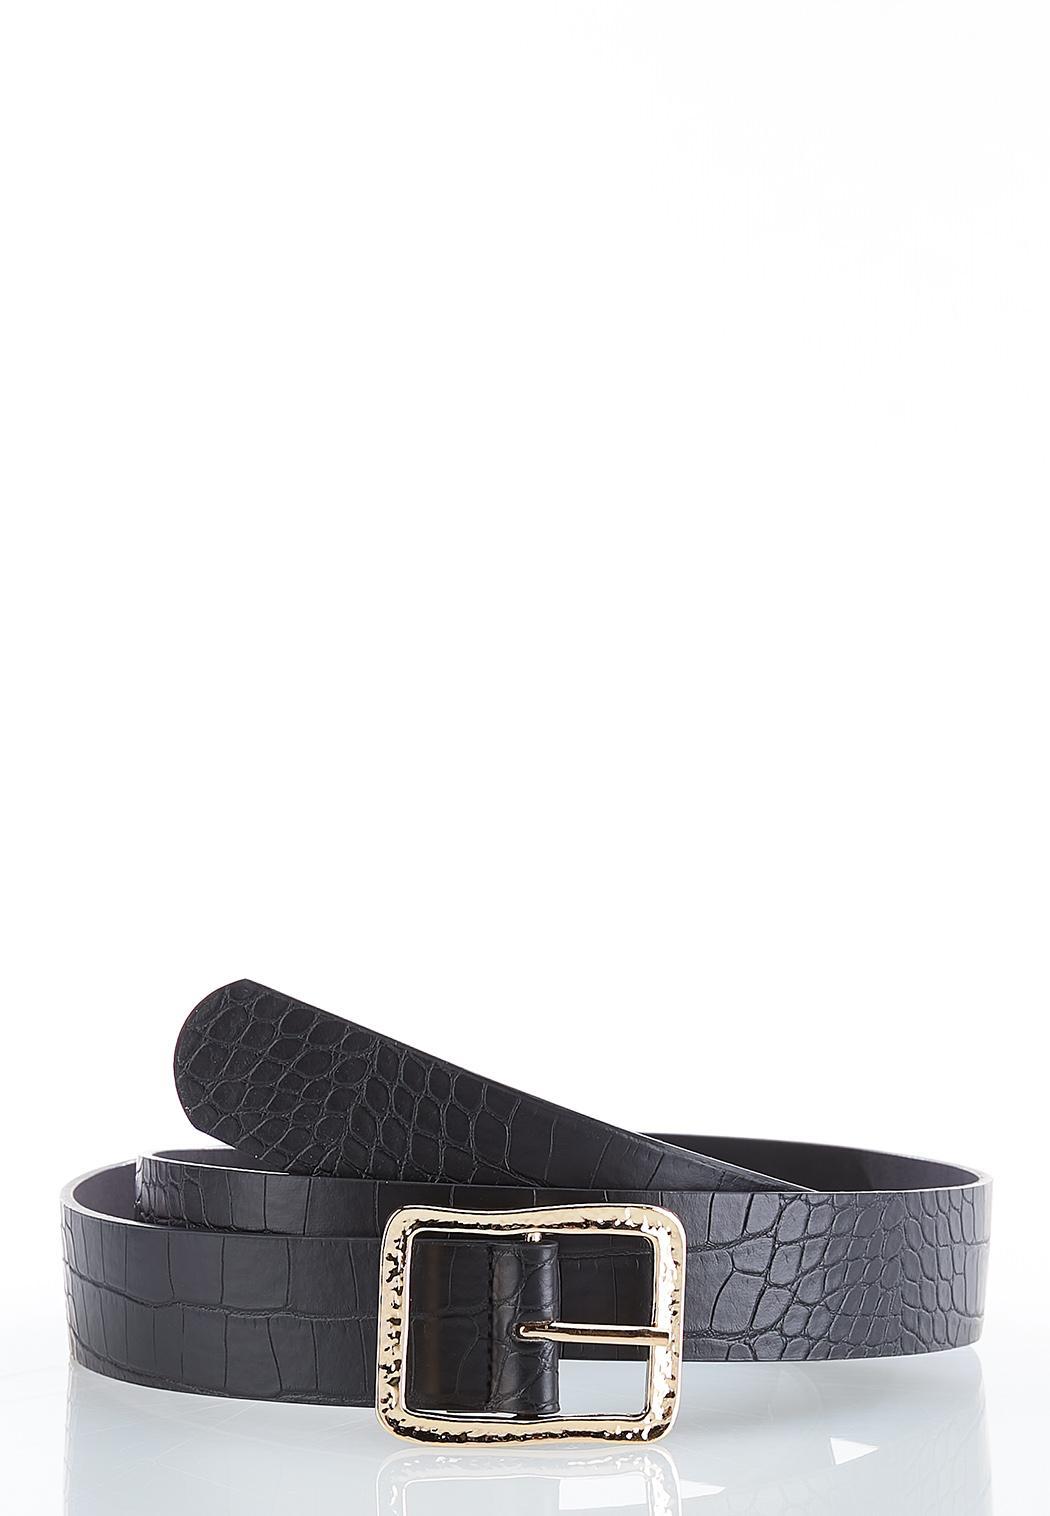 Plus Size Croc Hammered Buckle Belt